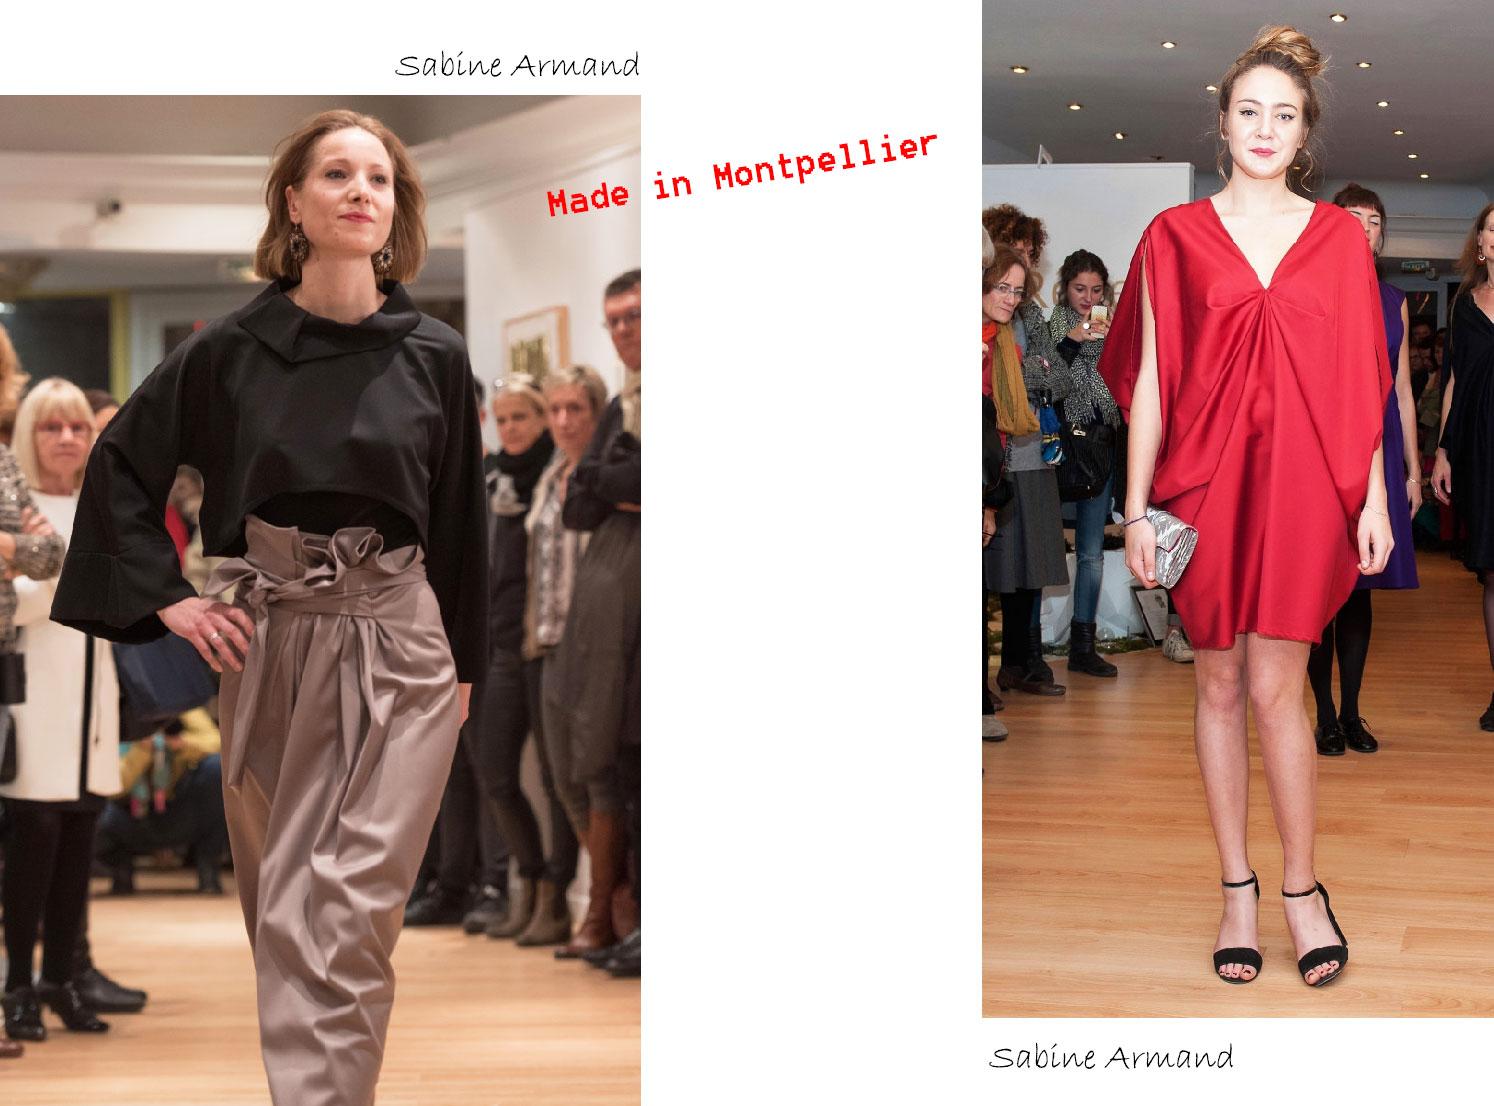 Sabine-Armand-défilé---Les-Jolies-Quinquas